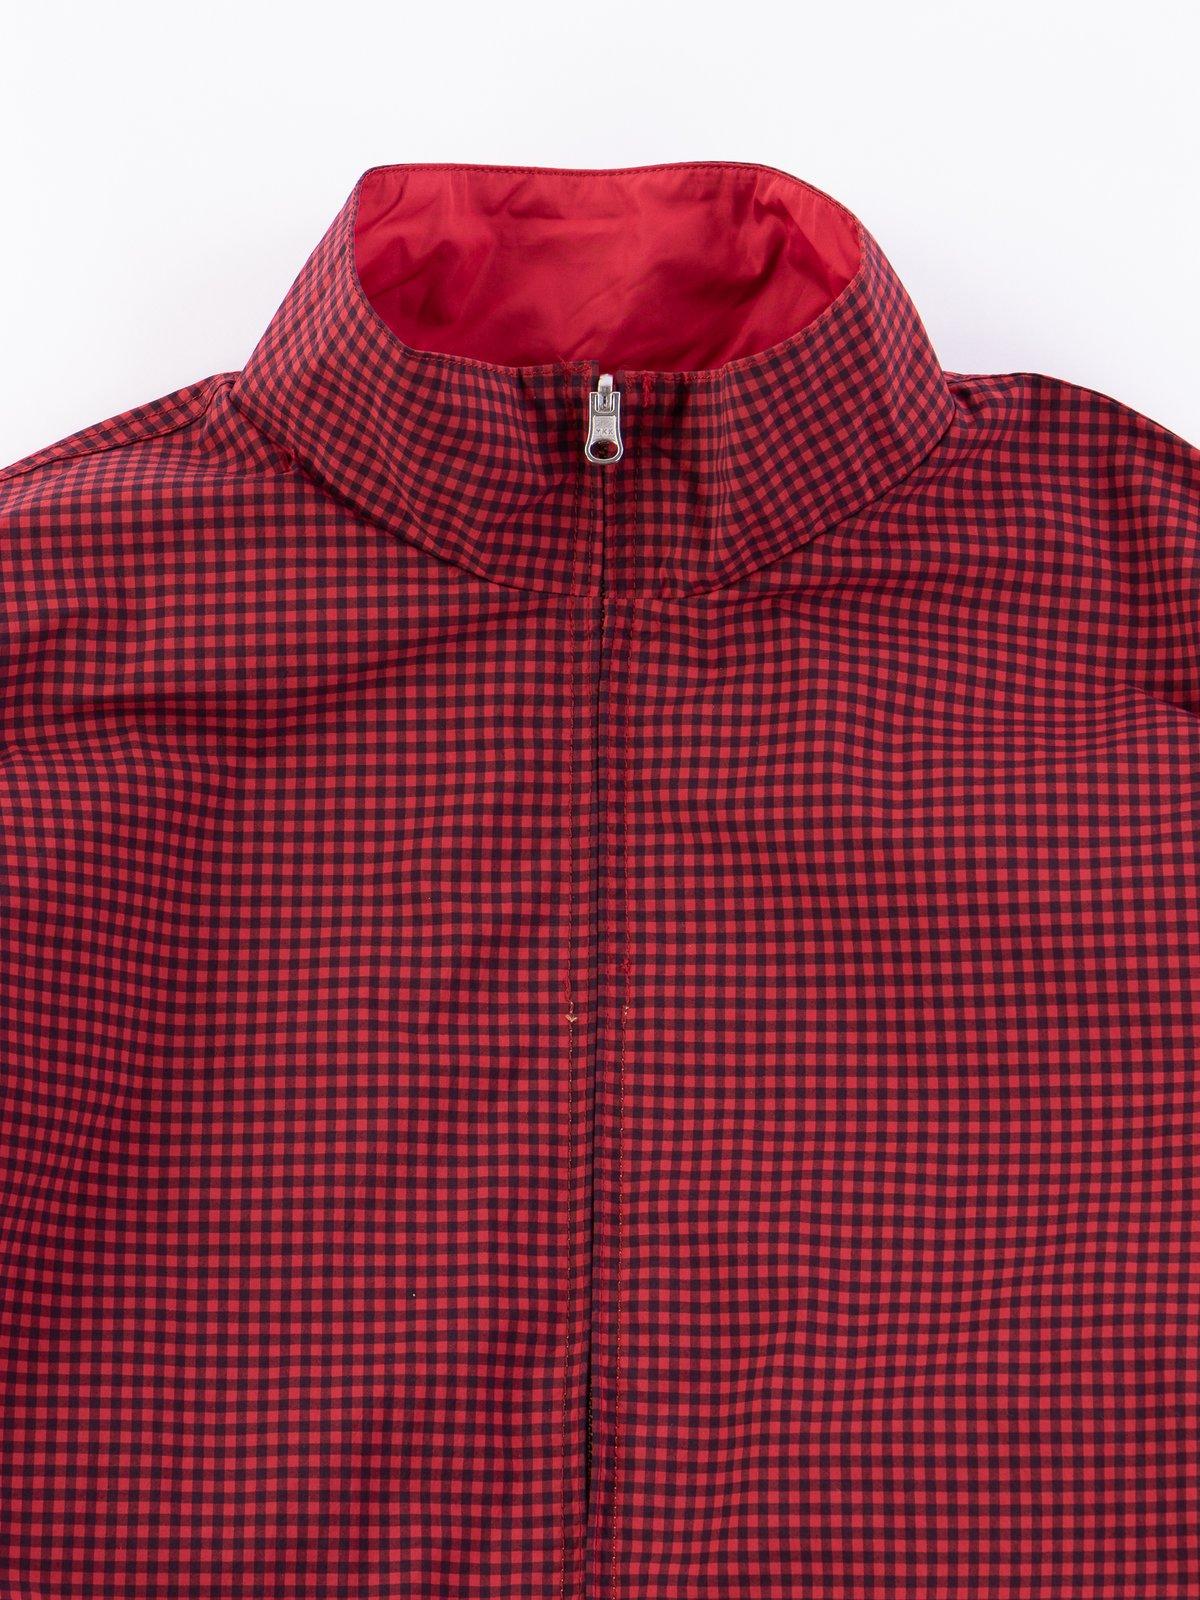 Red Gingham Reversible Jacket - Image 3